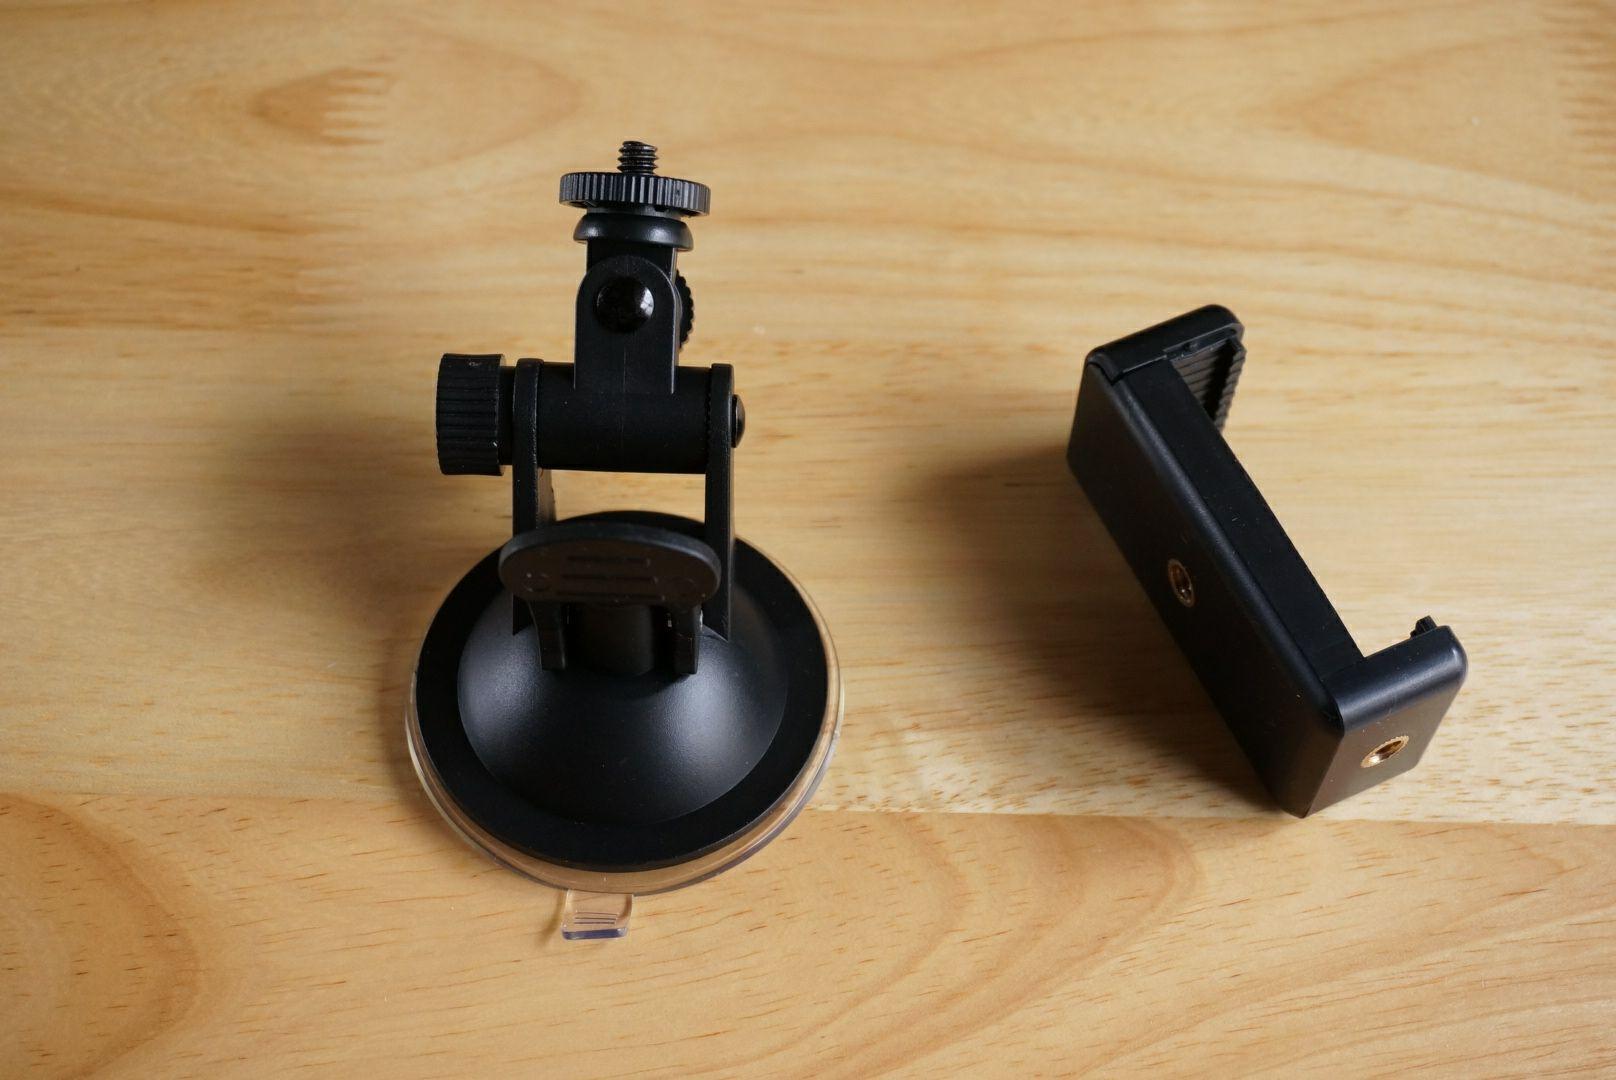 Eco Ride World 車載カメラホルダー スタンド吸盤式マウント CS_009 2WAY Mount